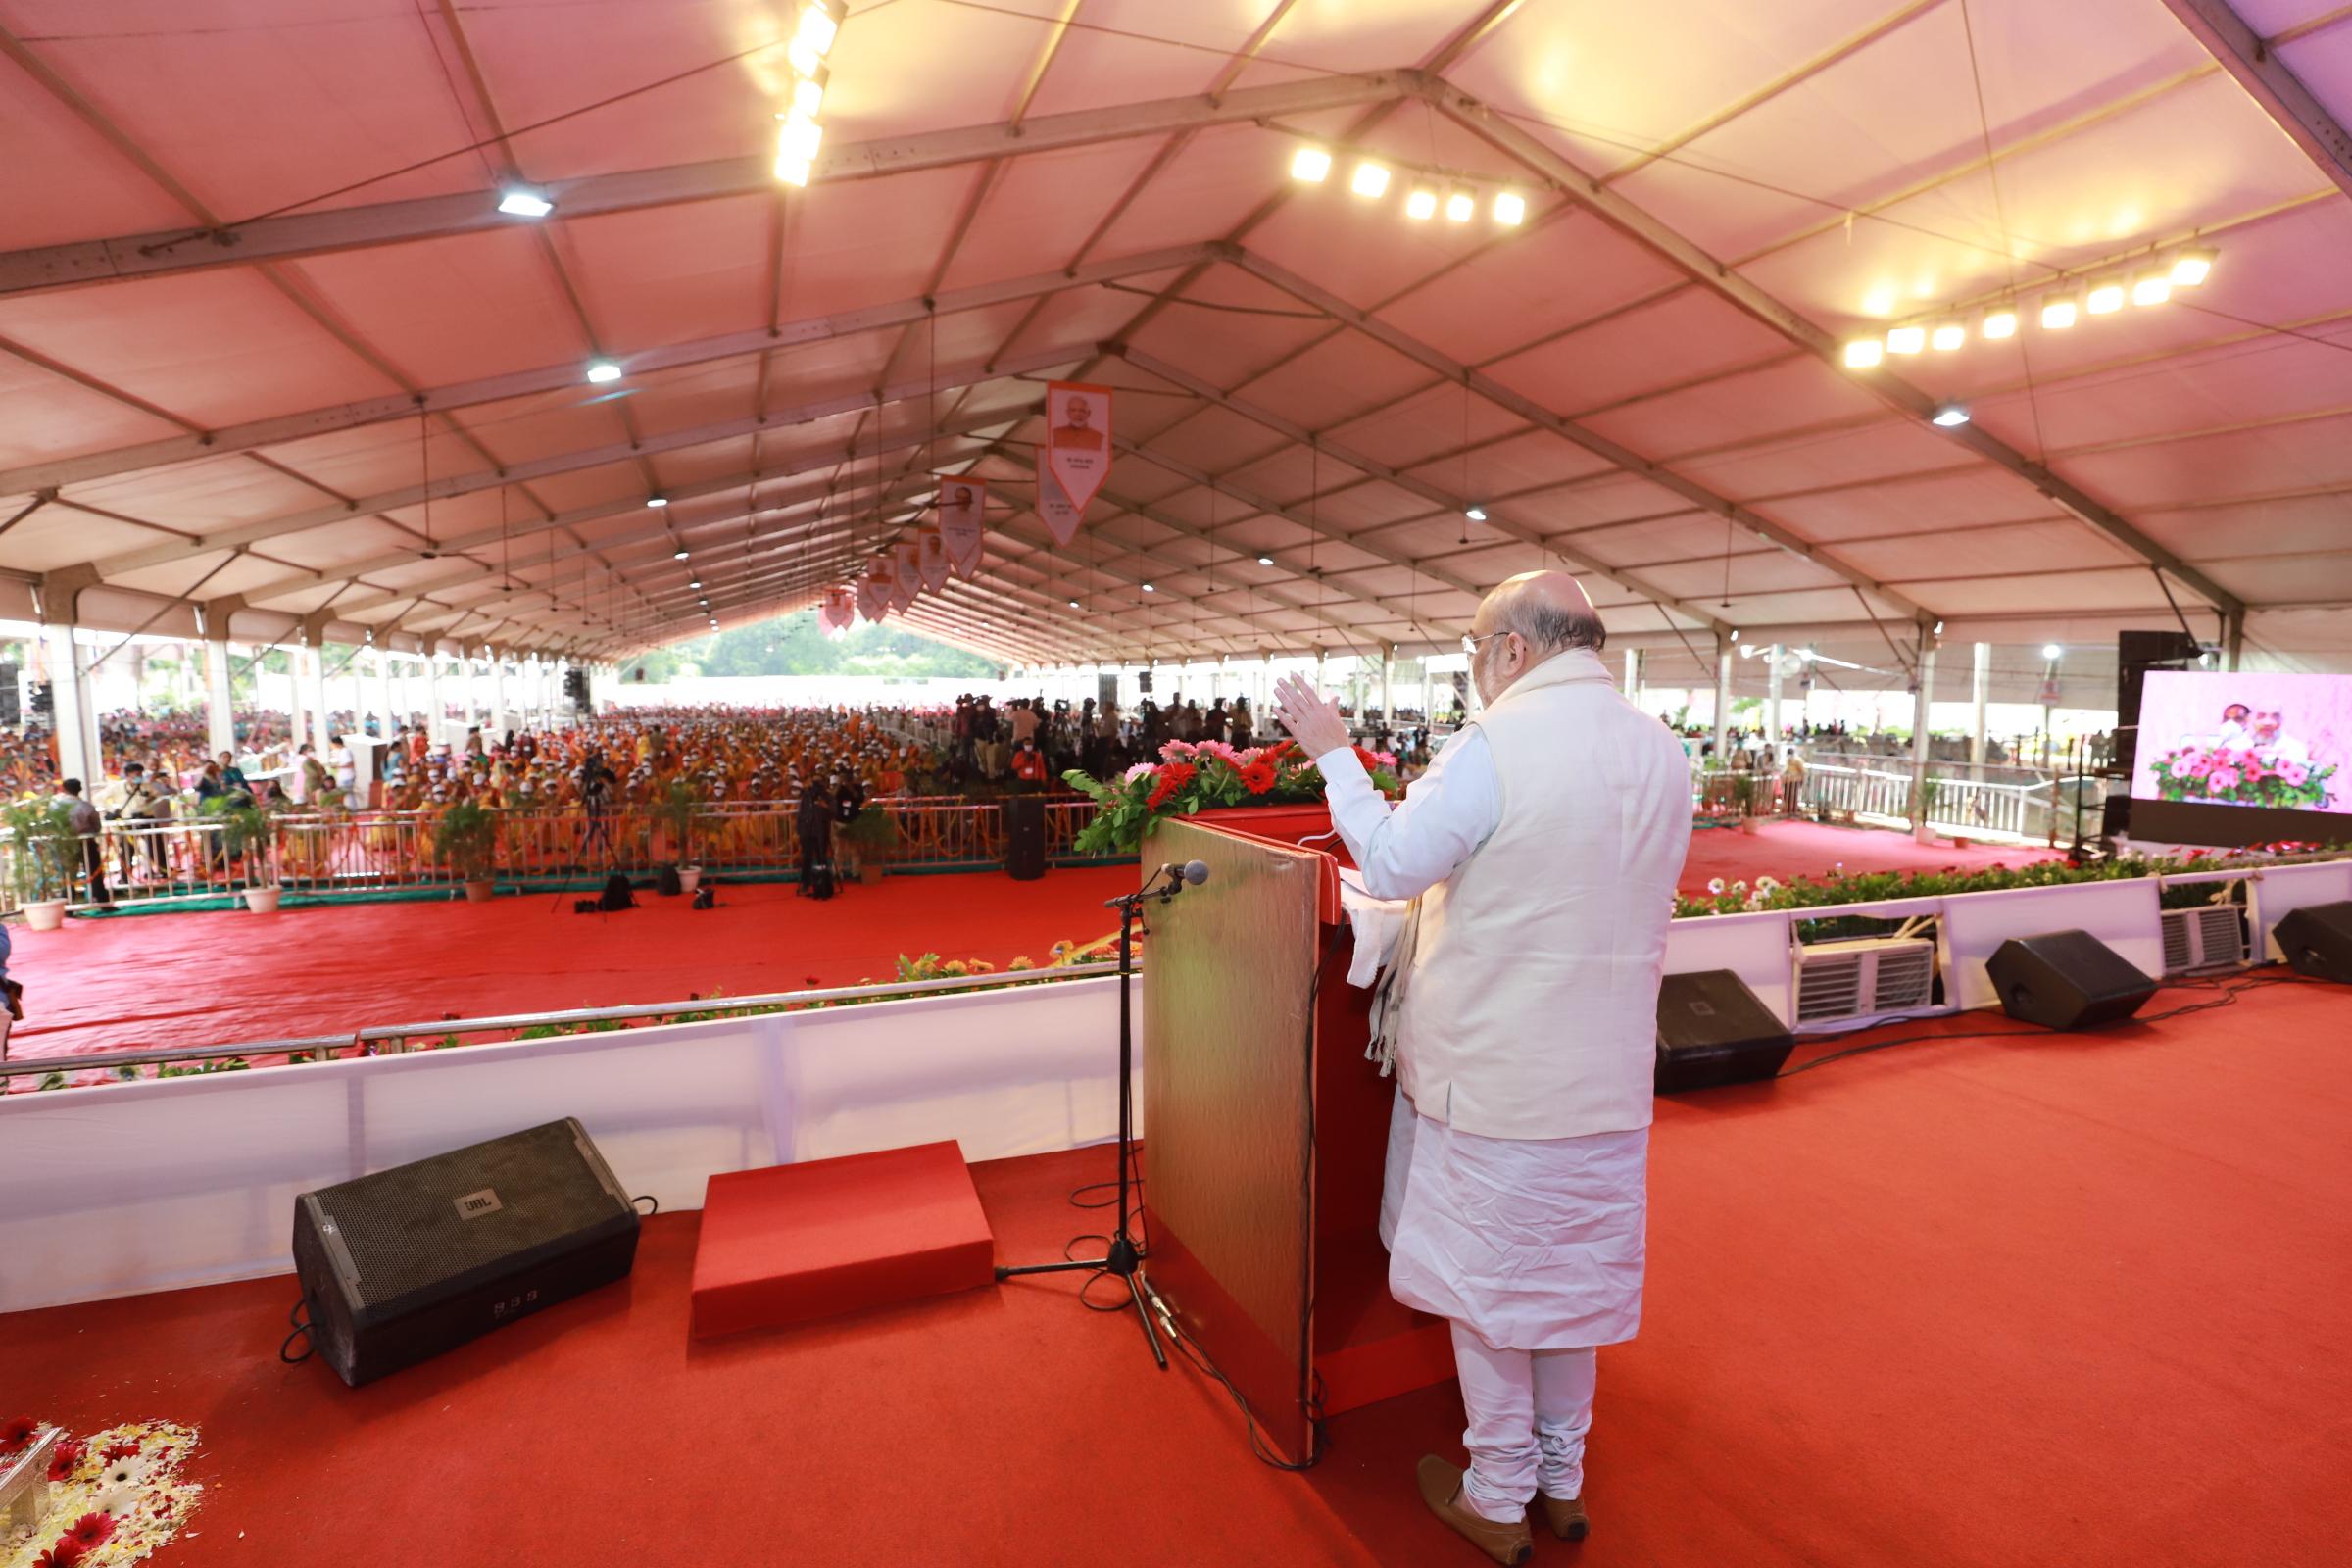 Shri Amit Shah launched Pradhan Mantri Ujjwala-2.0 Yojana today in Jabalpur, Madhya Pradesh